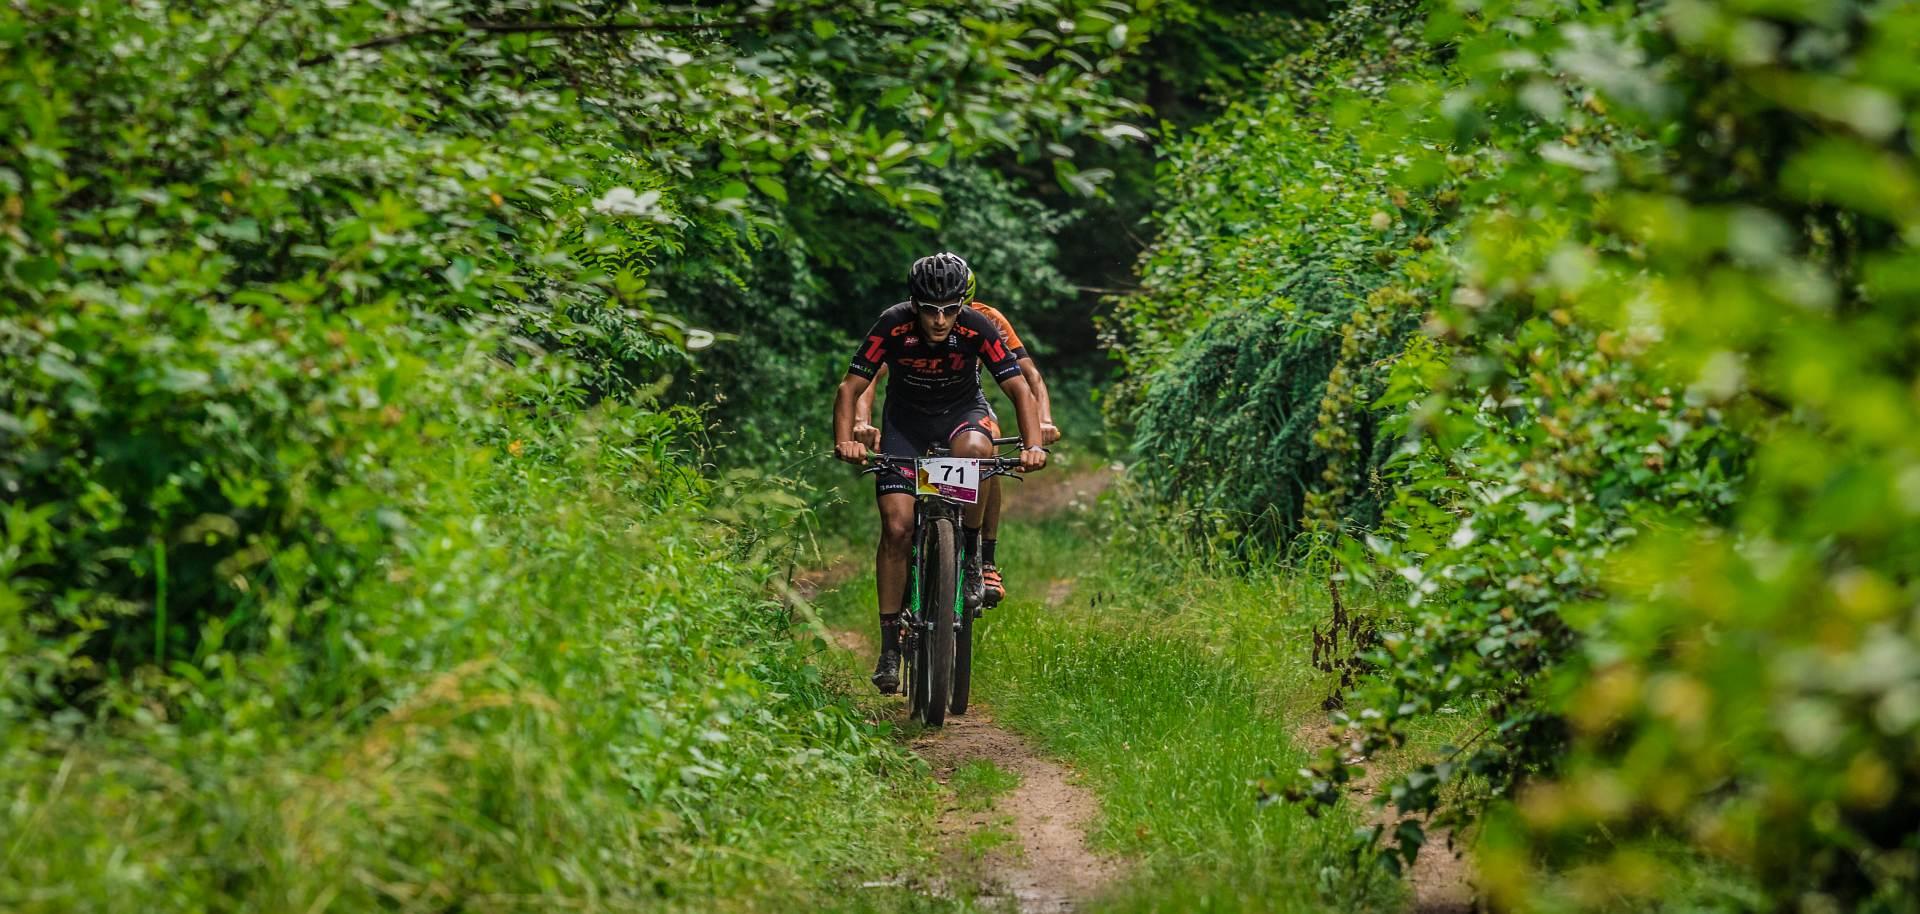 wyscig-rowerow-gorskich-0095